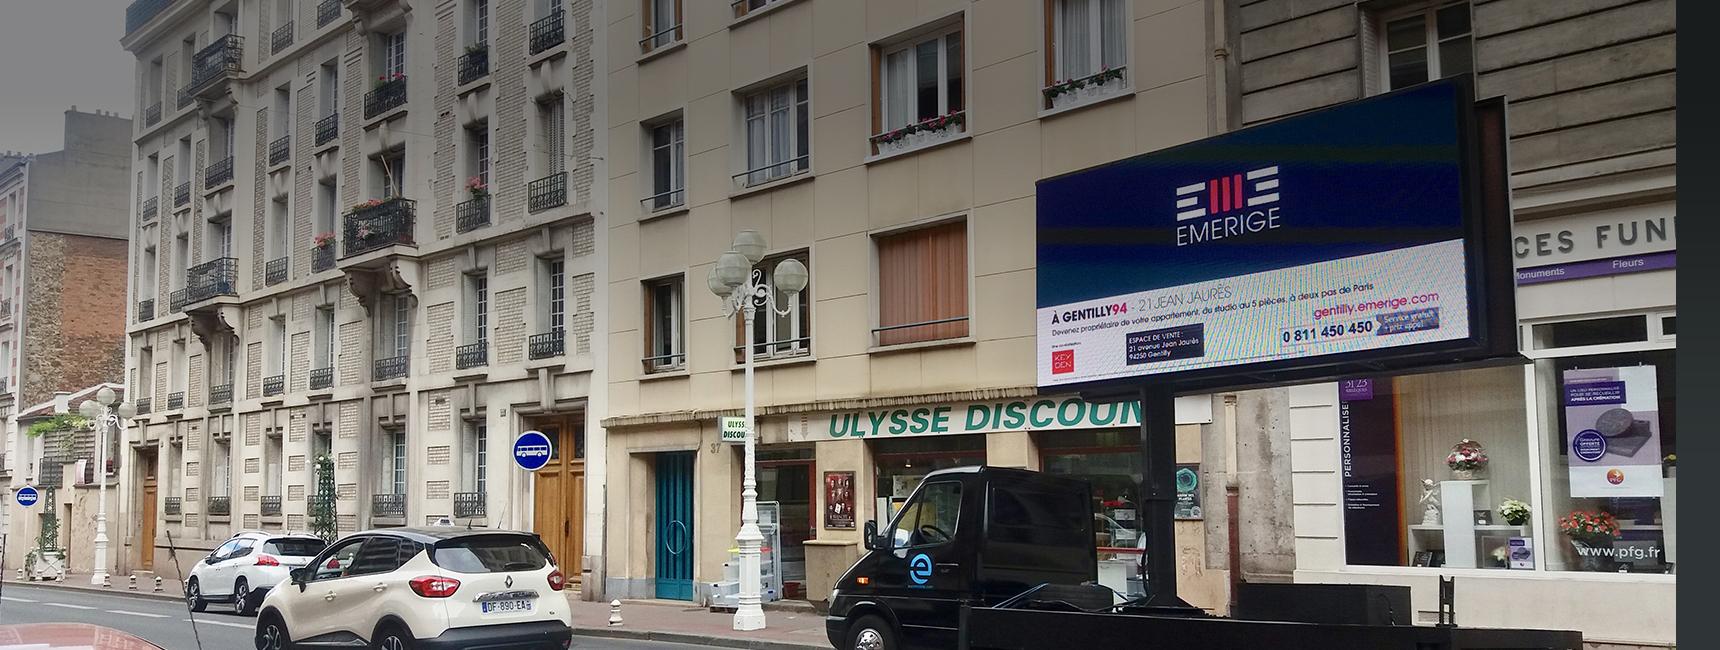 Emerige - affichage mobile - Keemia agence marketing local Paris